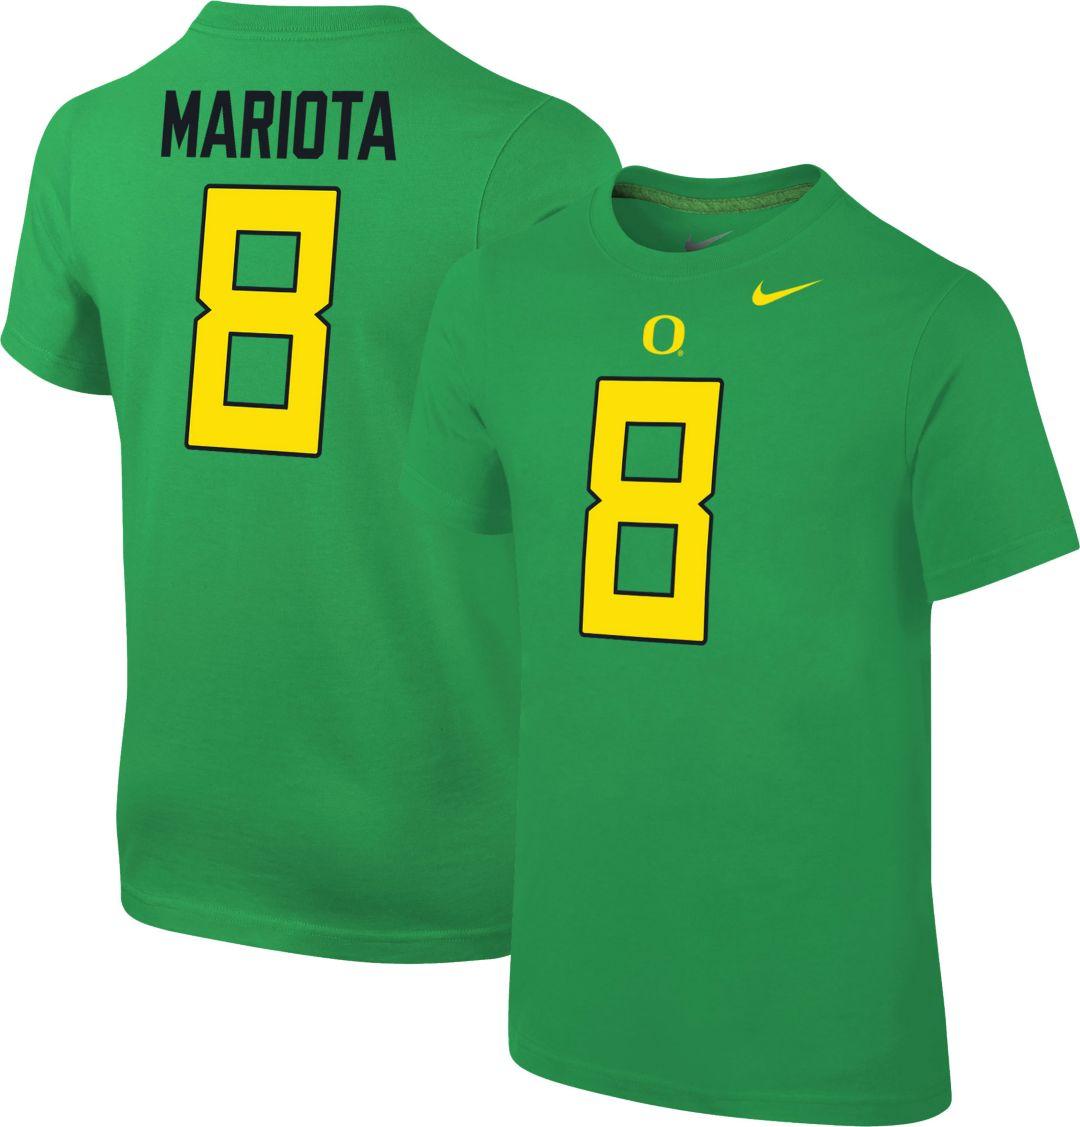 sports shoes d14e9 bf0ad Nike Youth Marcus Mariota Oregon Ducks #8 Green Cotton Football Jersey  T-Shirt